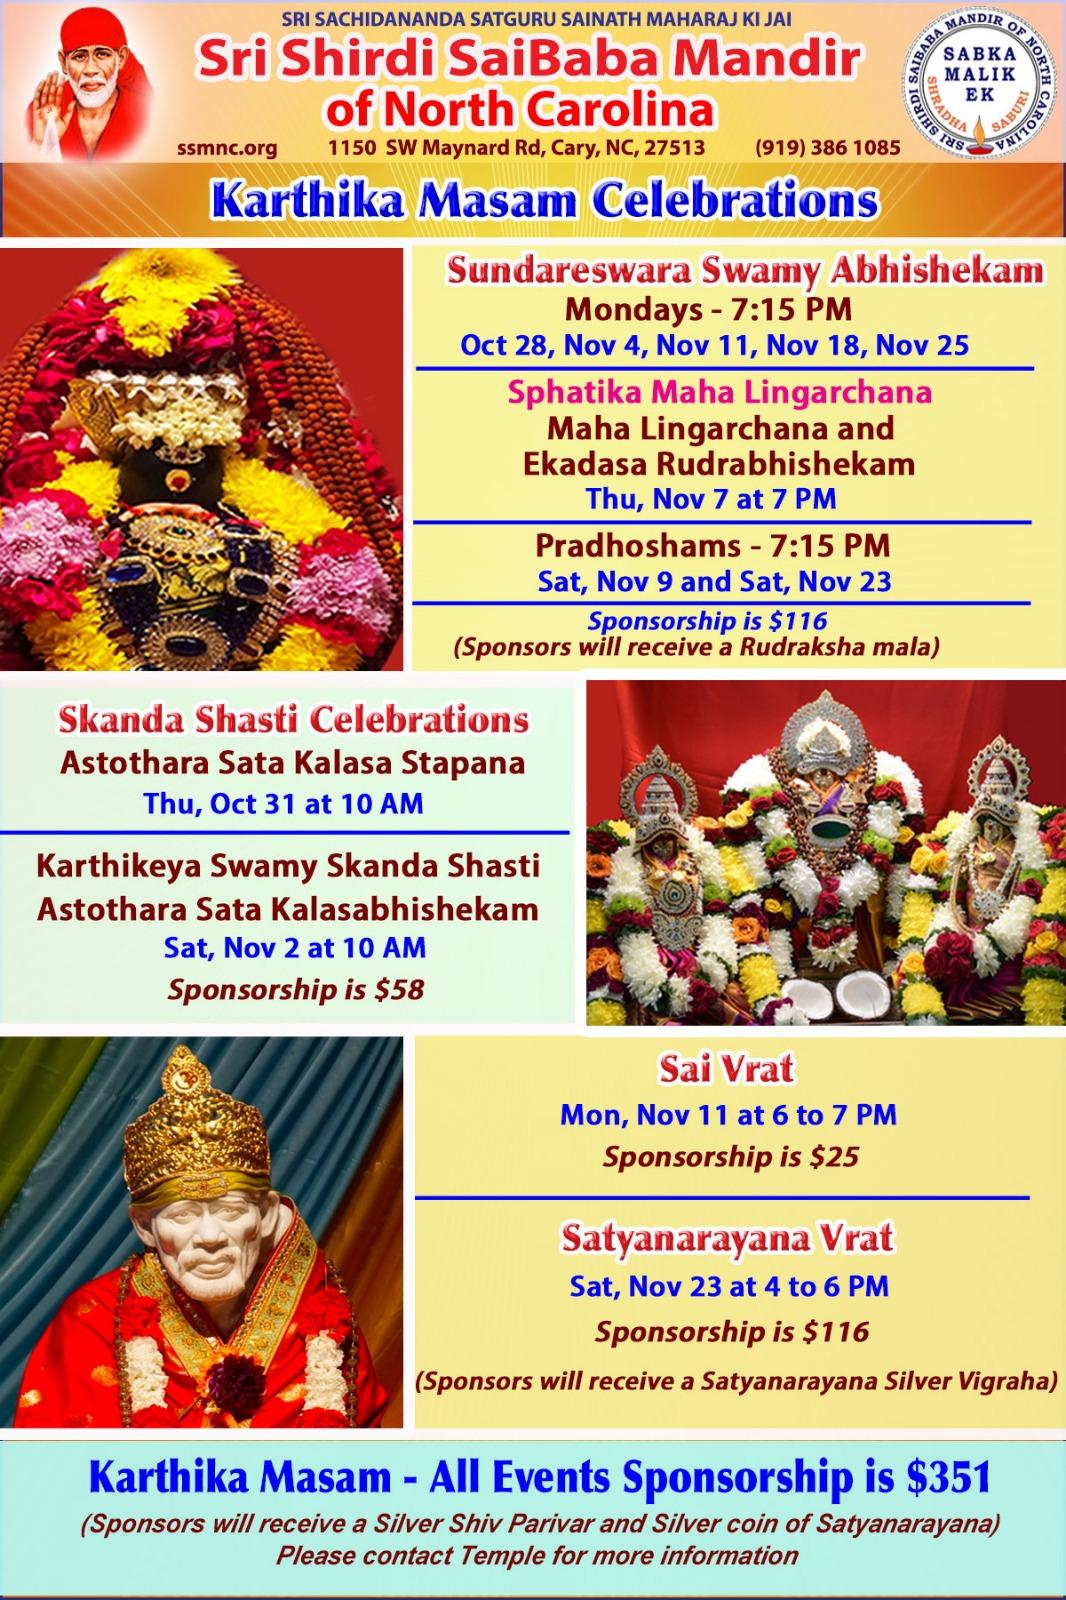 SSMNC_KaarthikaMasam